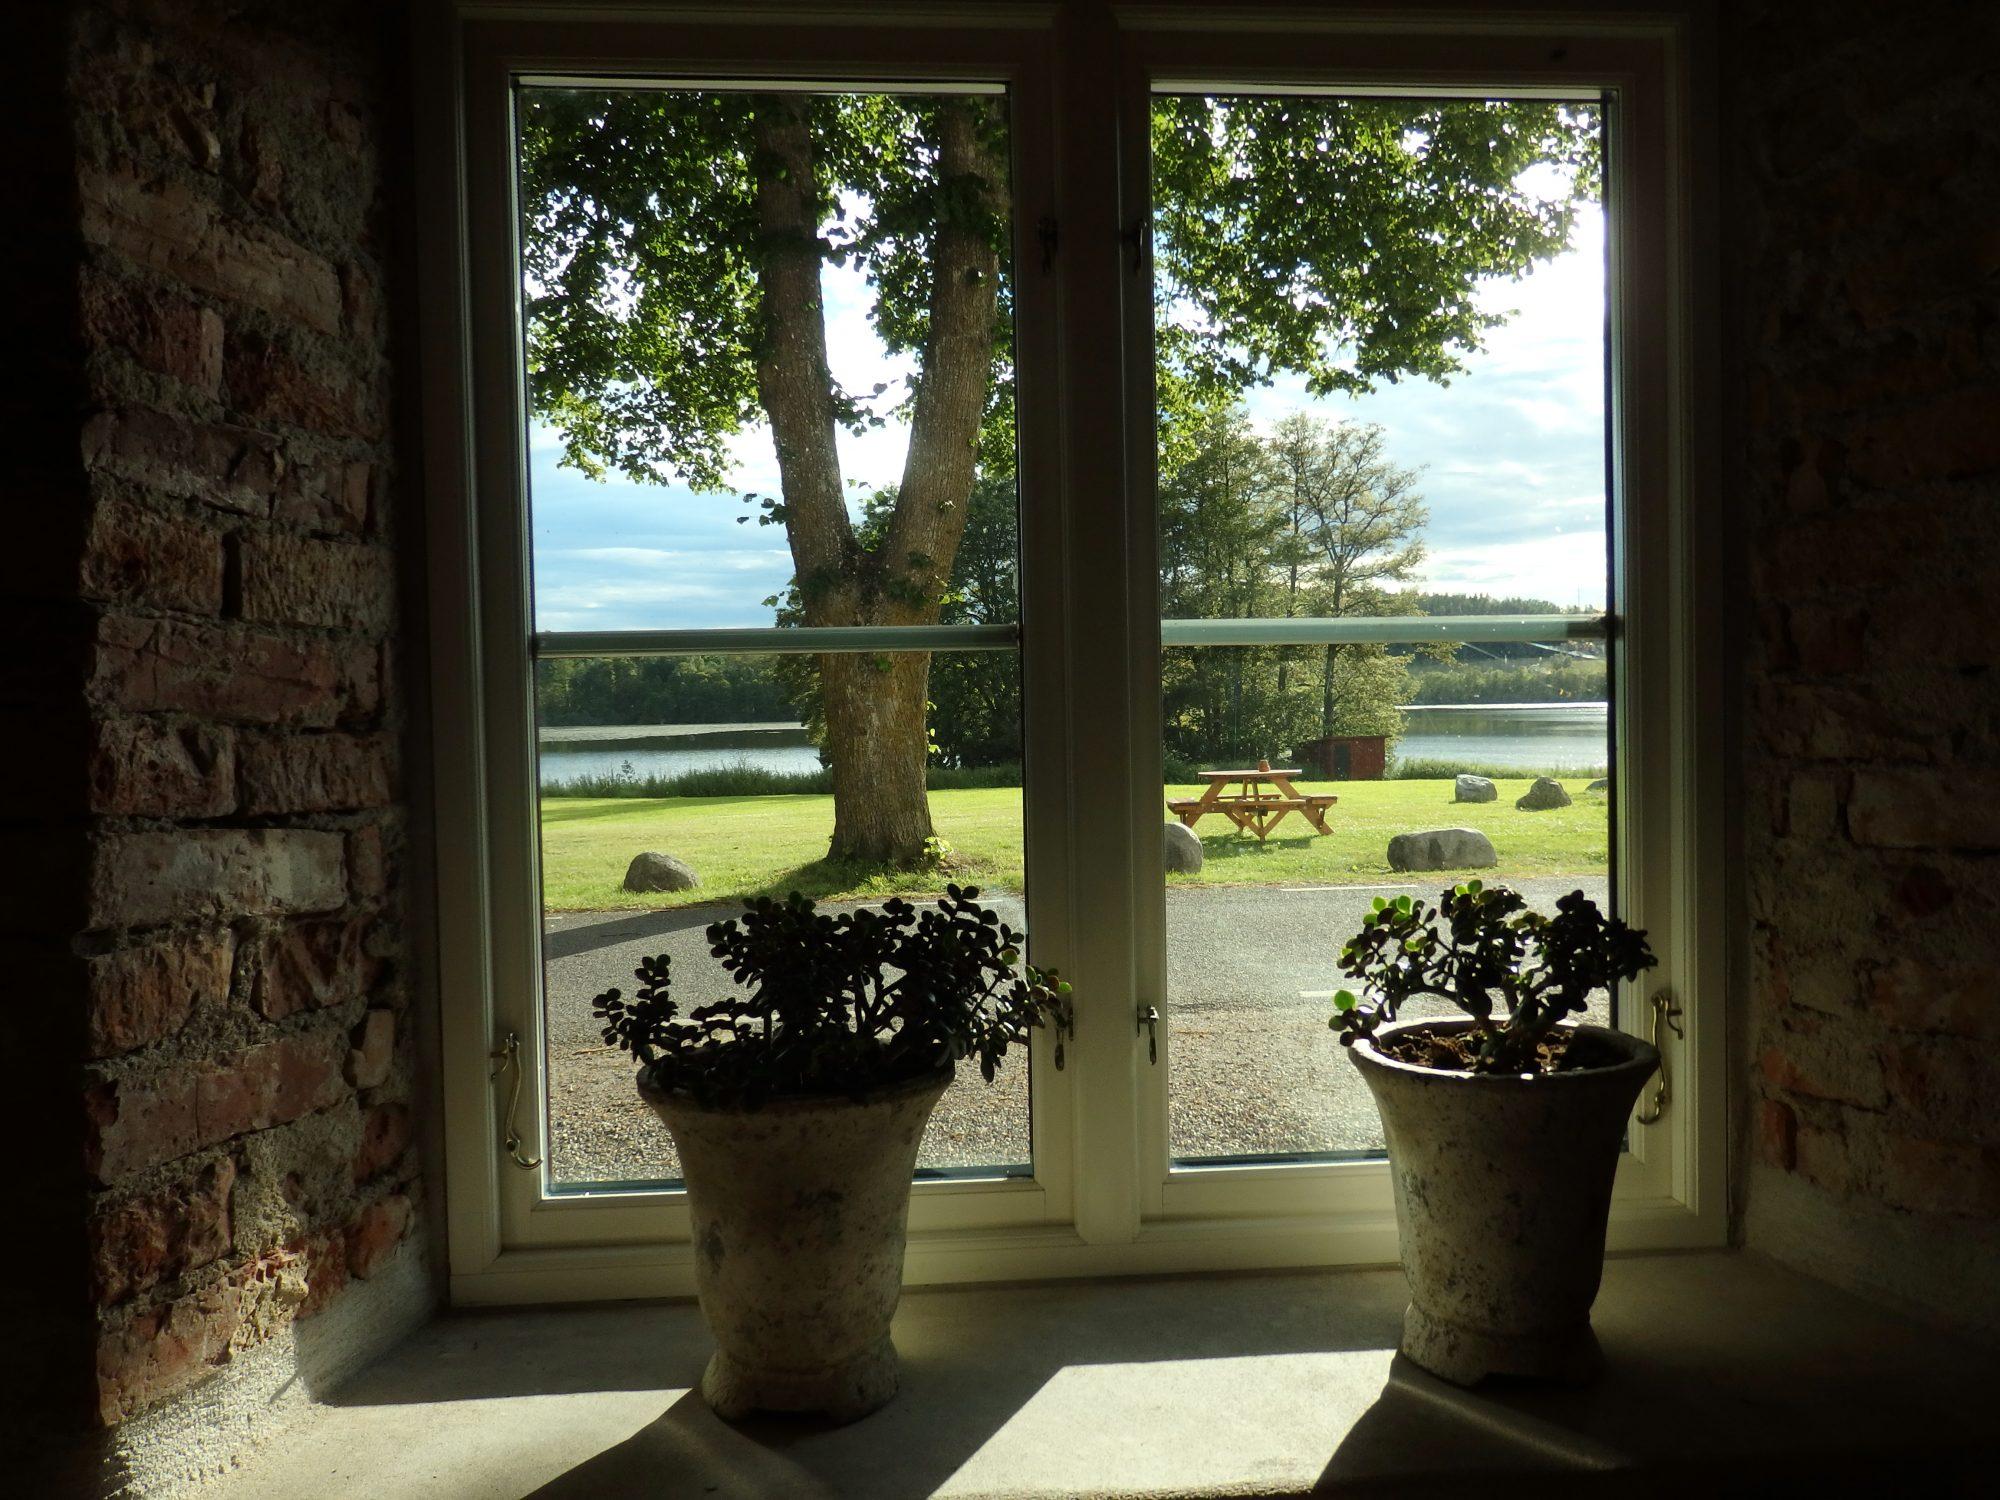 a view out of the main building toward the lake at Öster Malma